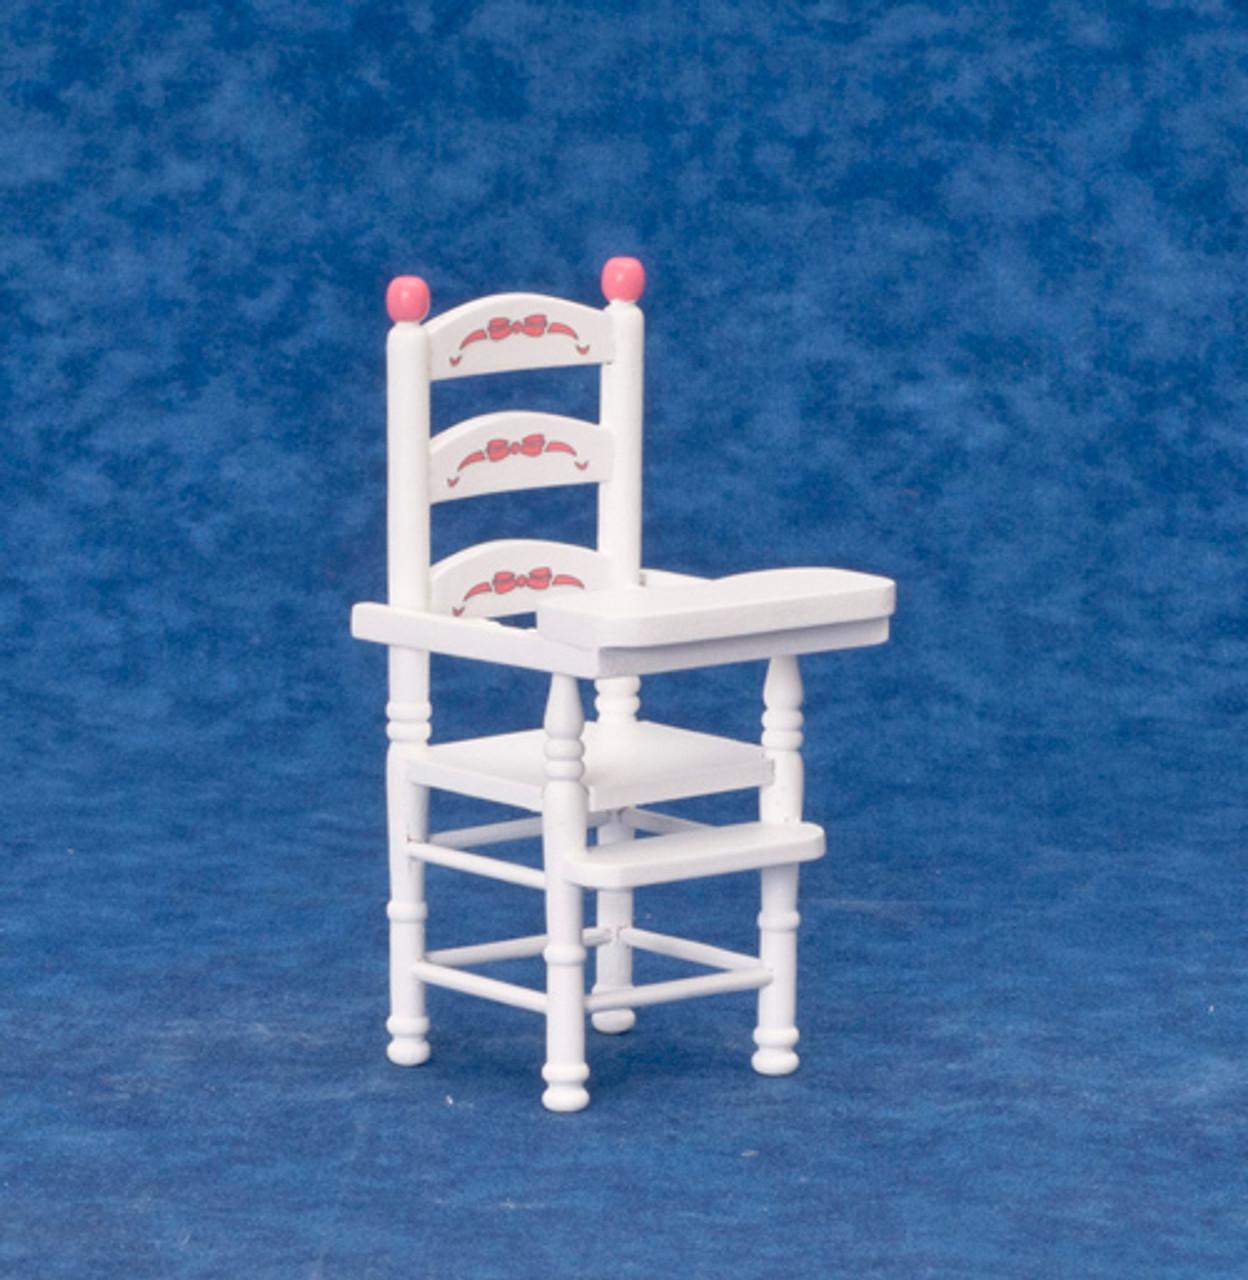 Dollhouse City - Dollhouse Miniatures High Chair - White